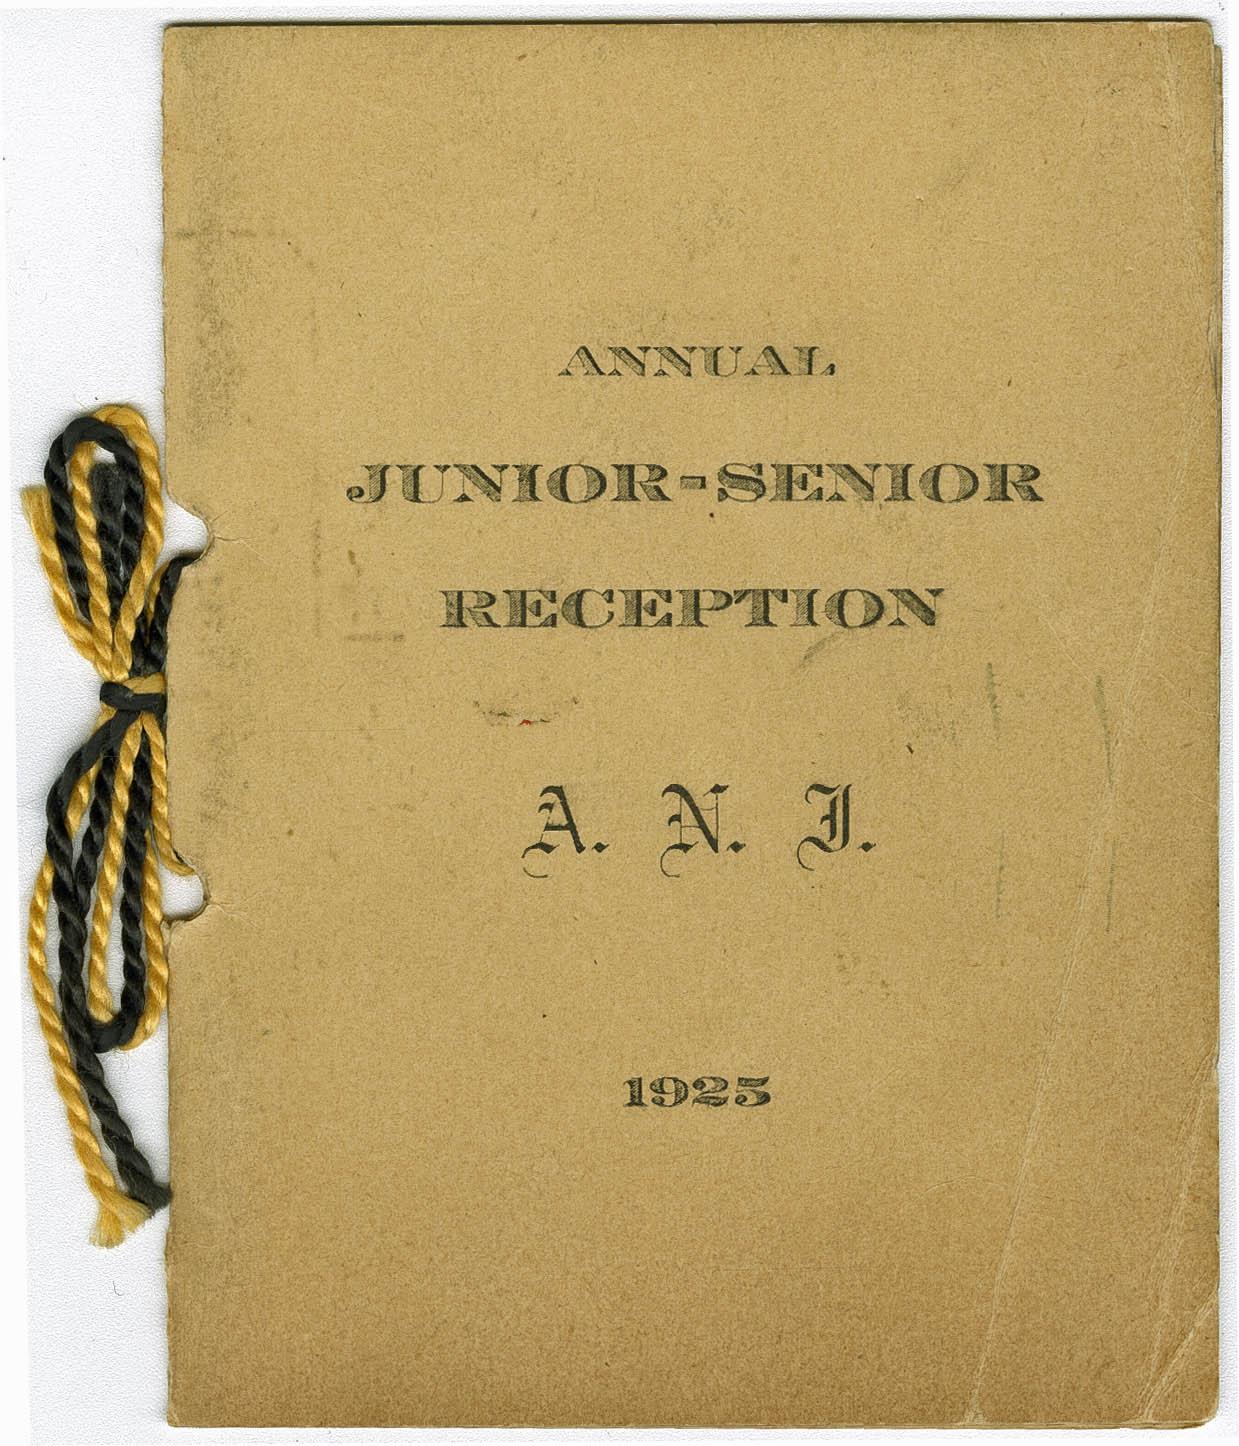 Program for the Annual Junior-Senior Reception